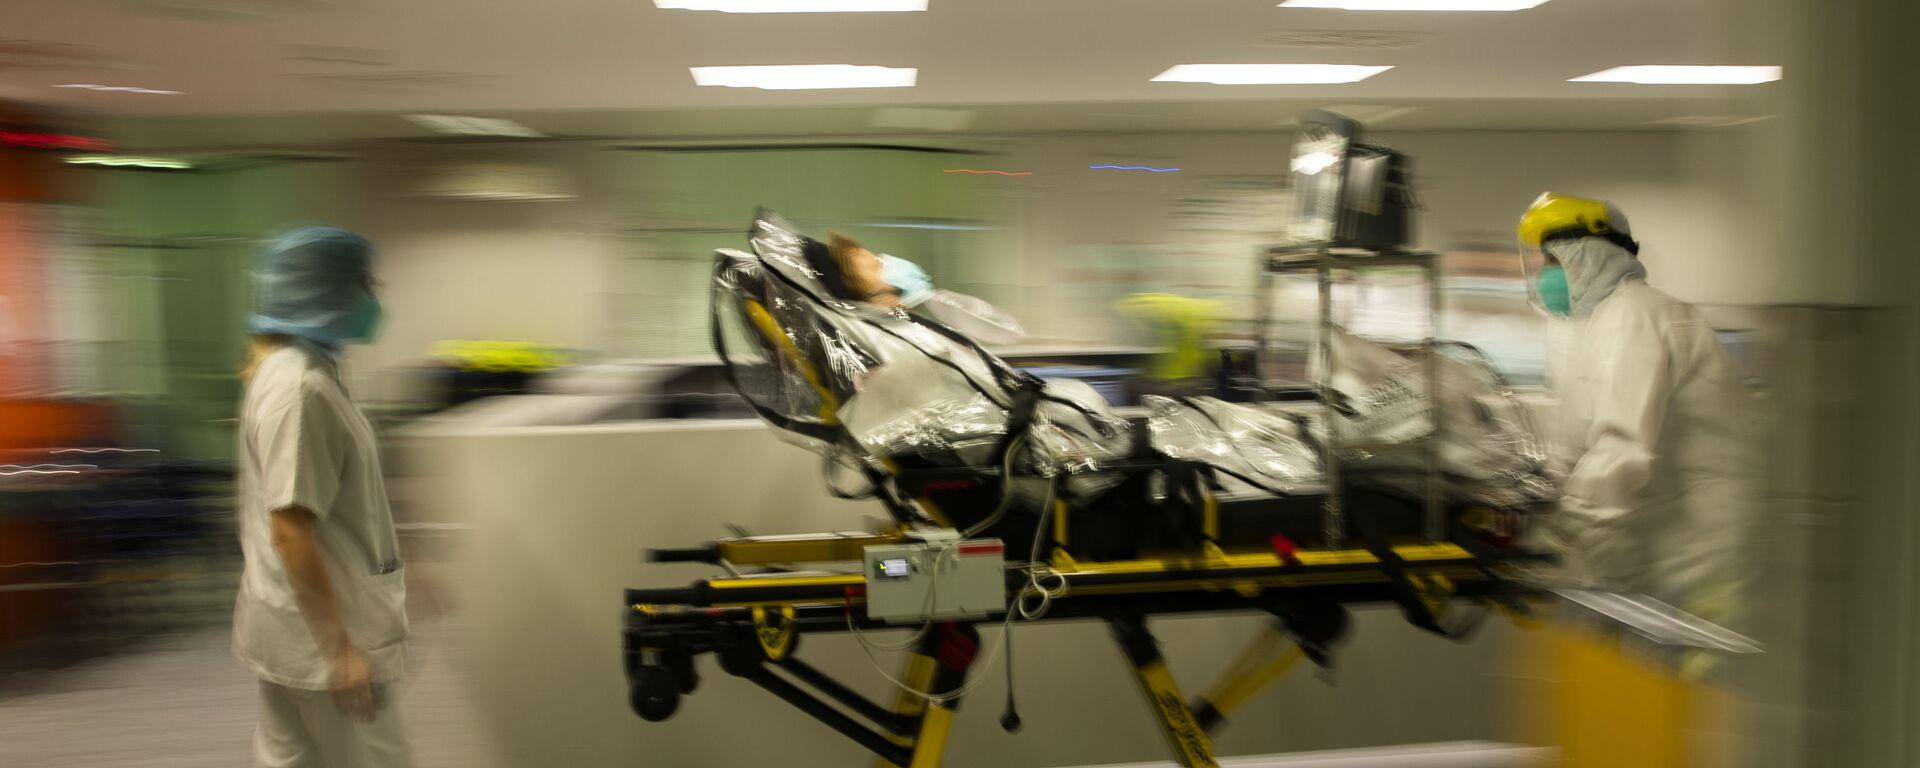 COVID-19-ის დაავადებული პაციენტი საავადმყოფოში - Sputnik საქართველო, 1920, 09.08.2021